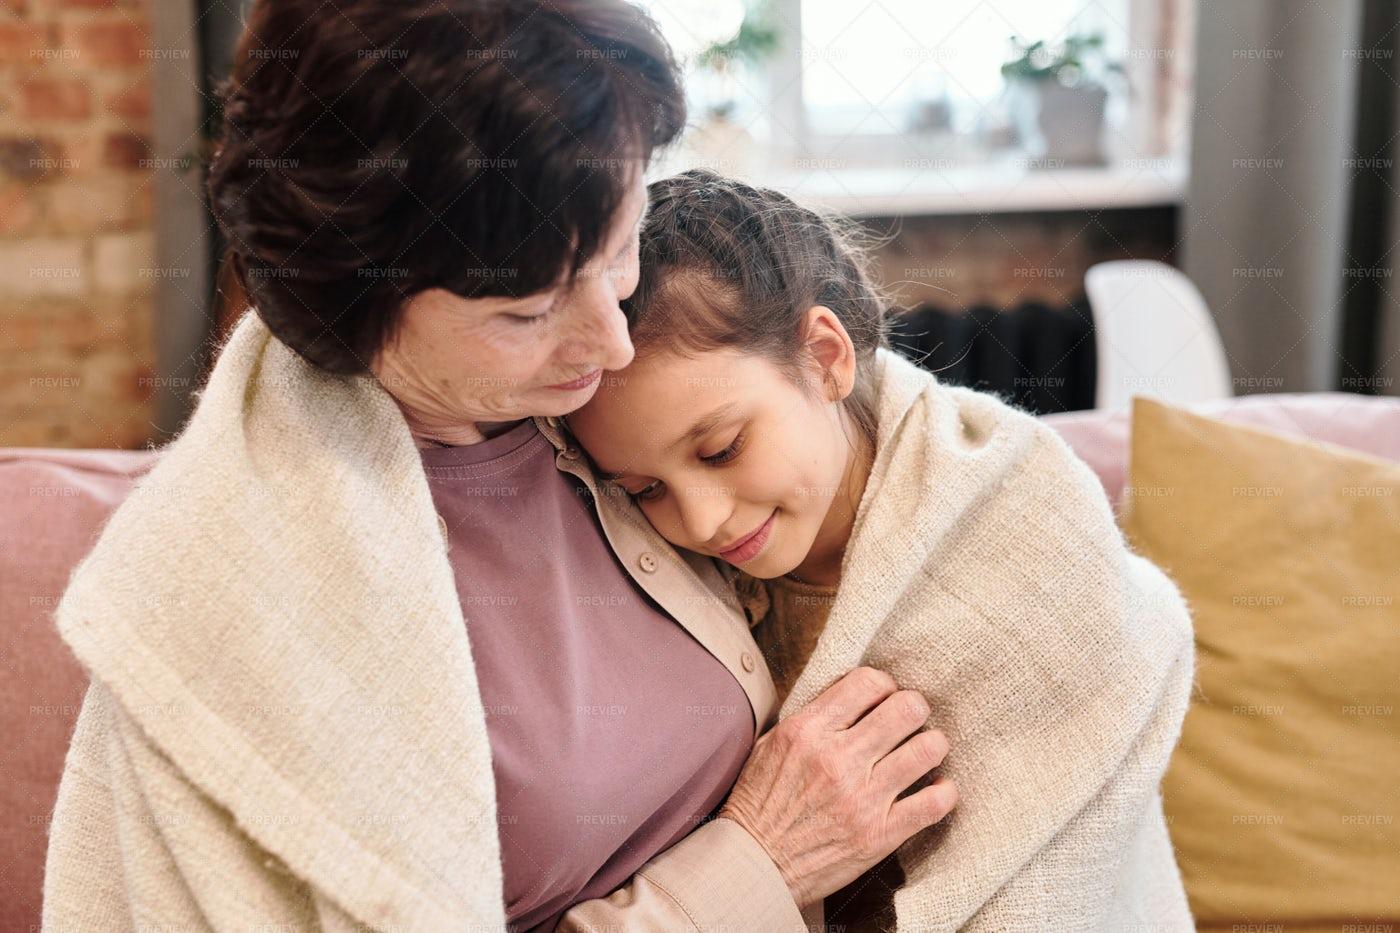 Cute Little Girl Embracing Grandmother: Stock Photos